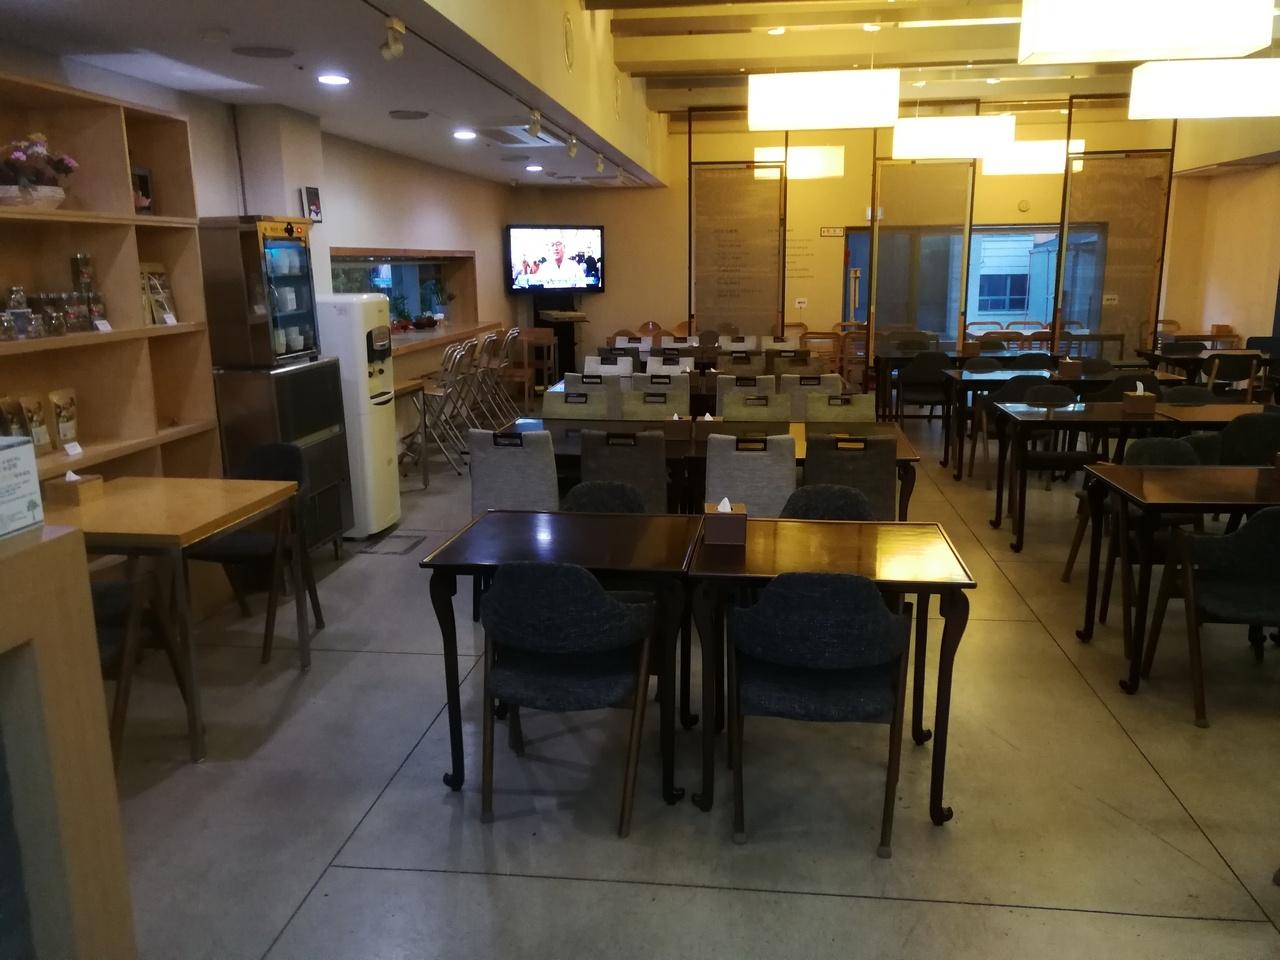 Manger vegetarien a seoul - The korean dream - Blog coree du sud 25